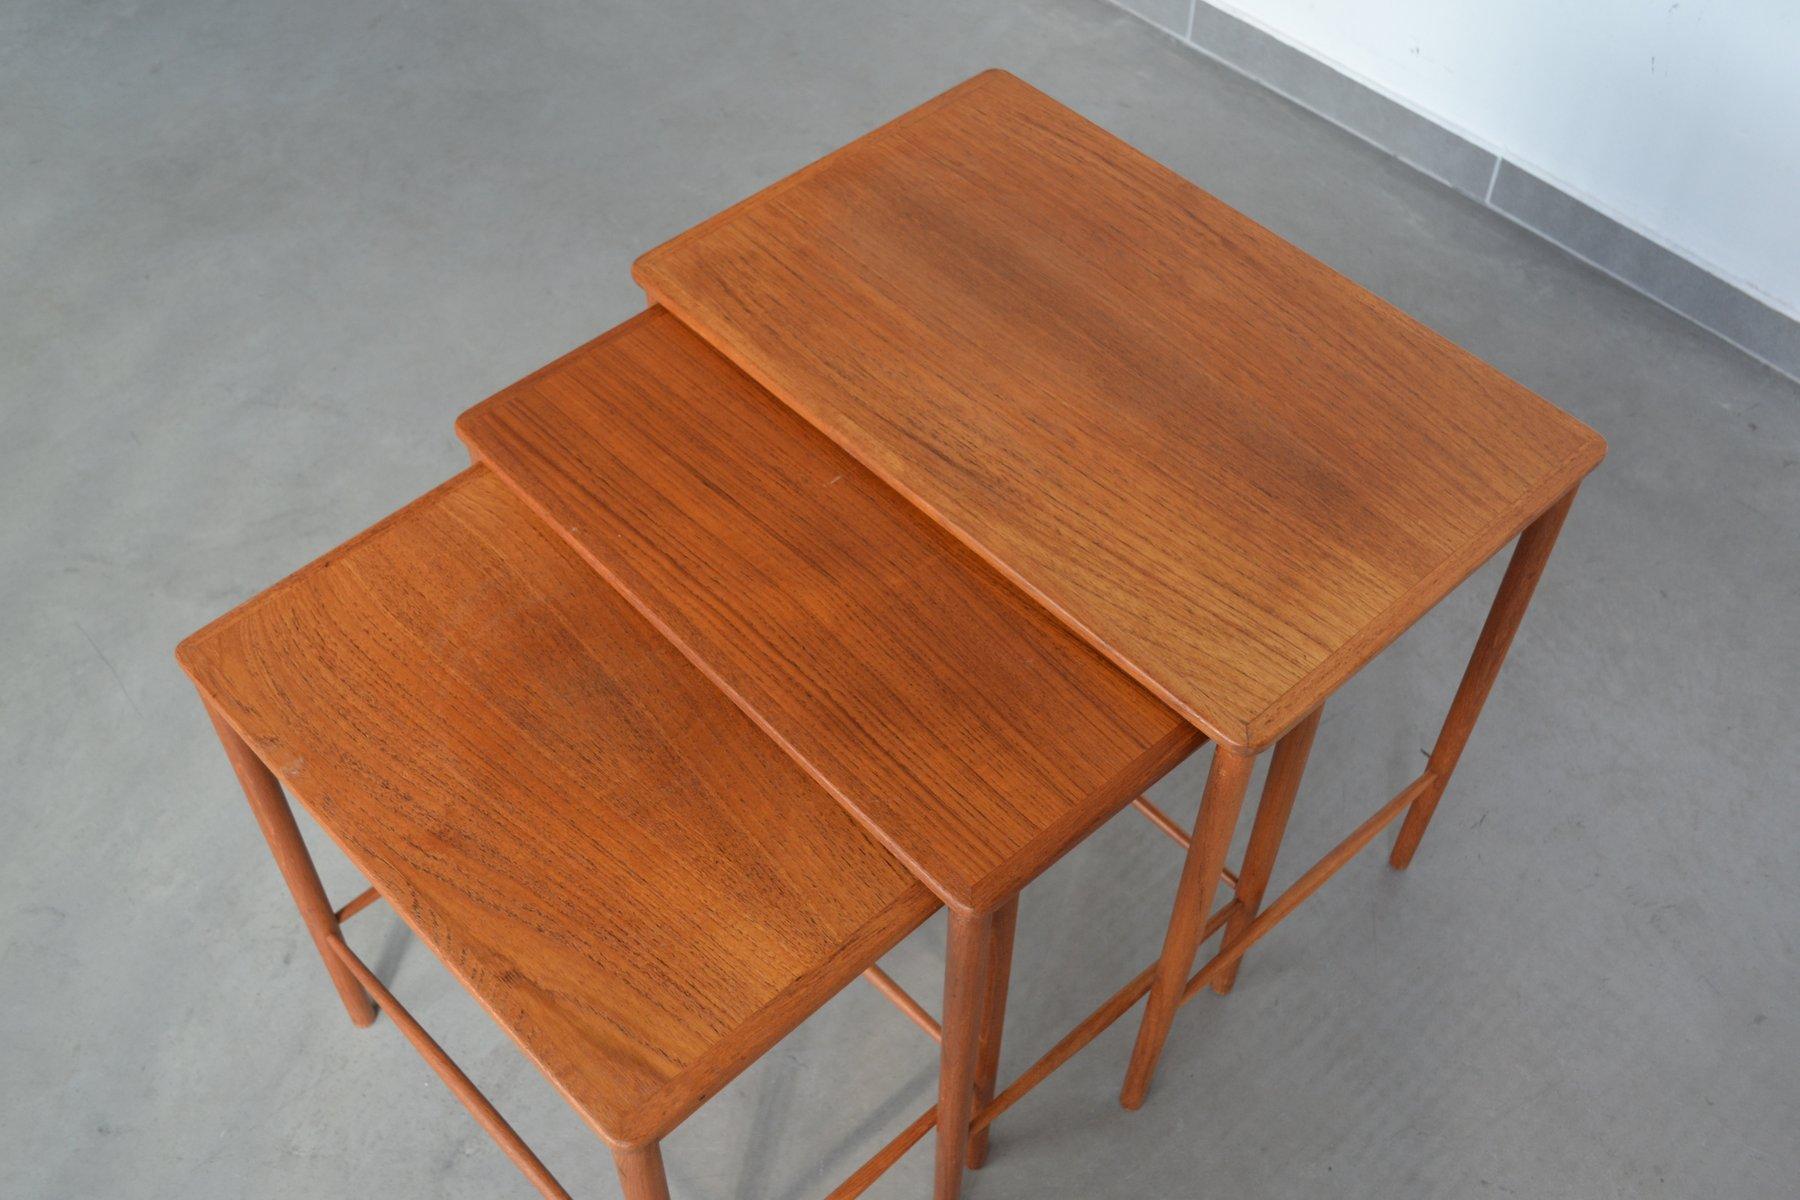 Nesting Tables By Grete Jalk For P. Jeppesens Møbelfabrik, 1960s 3. Previous